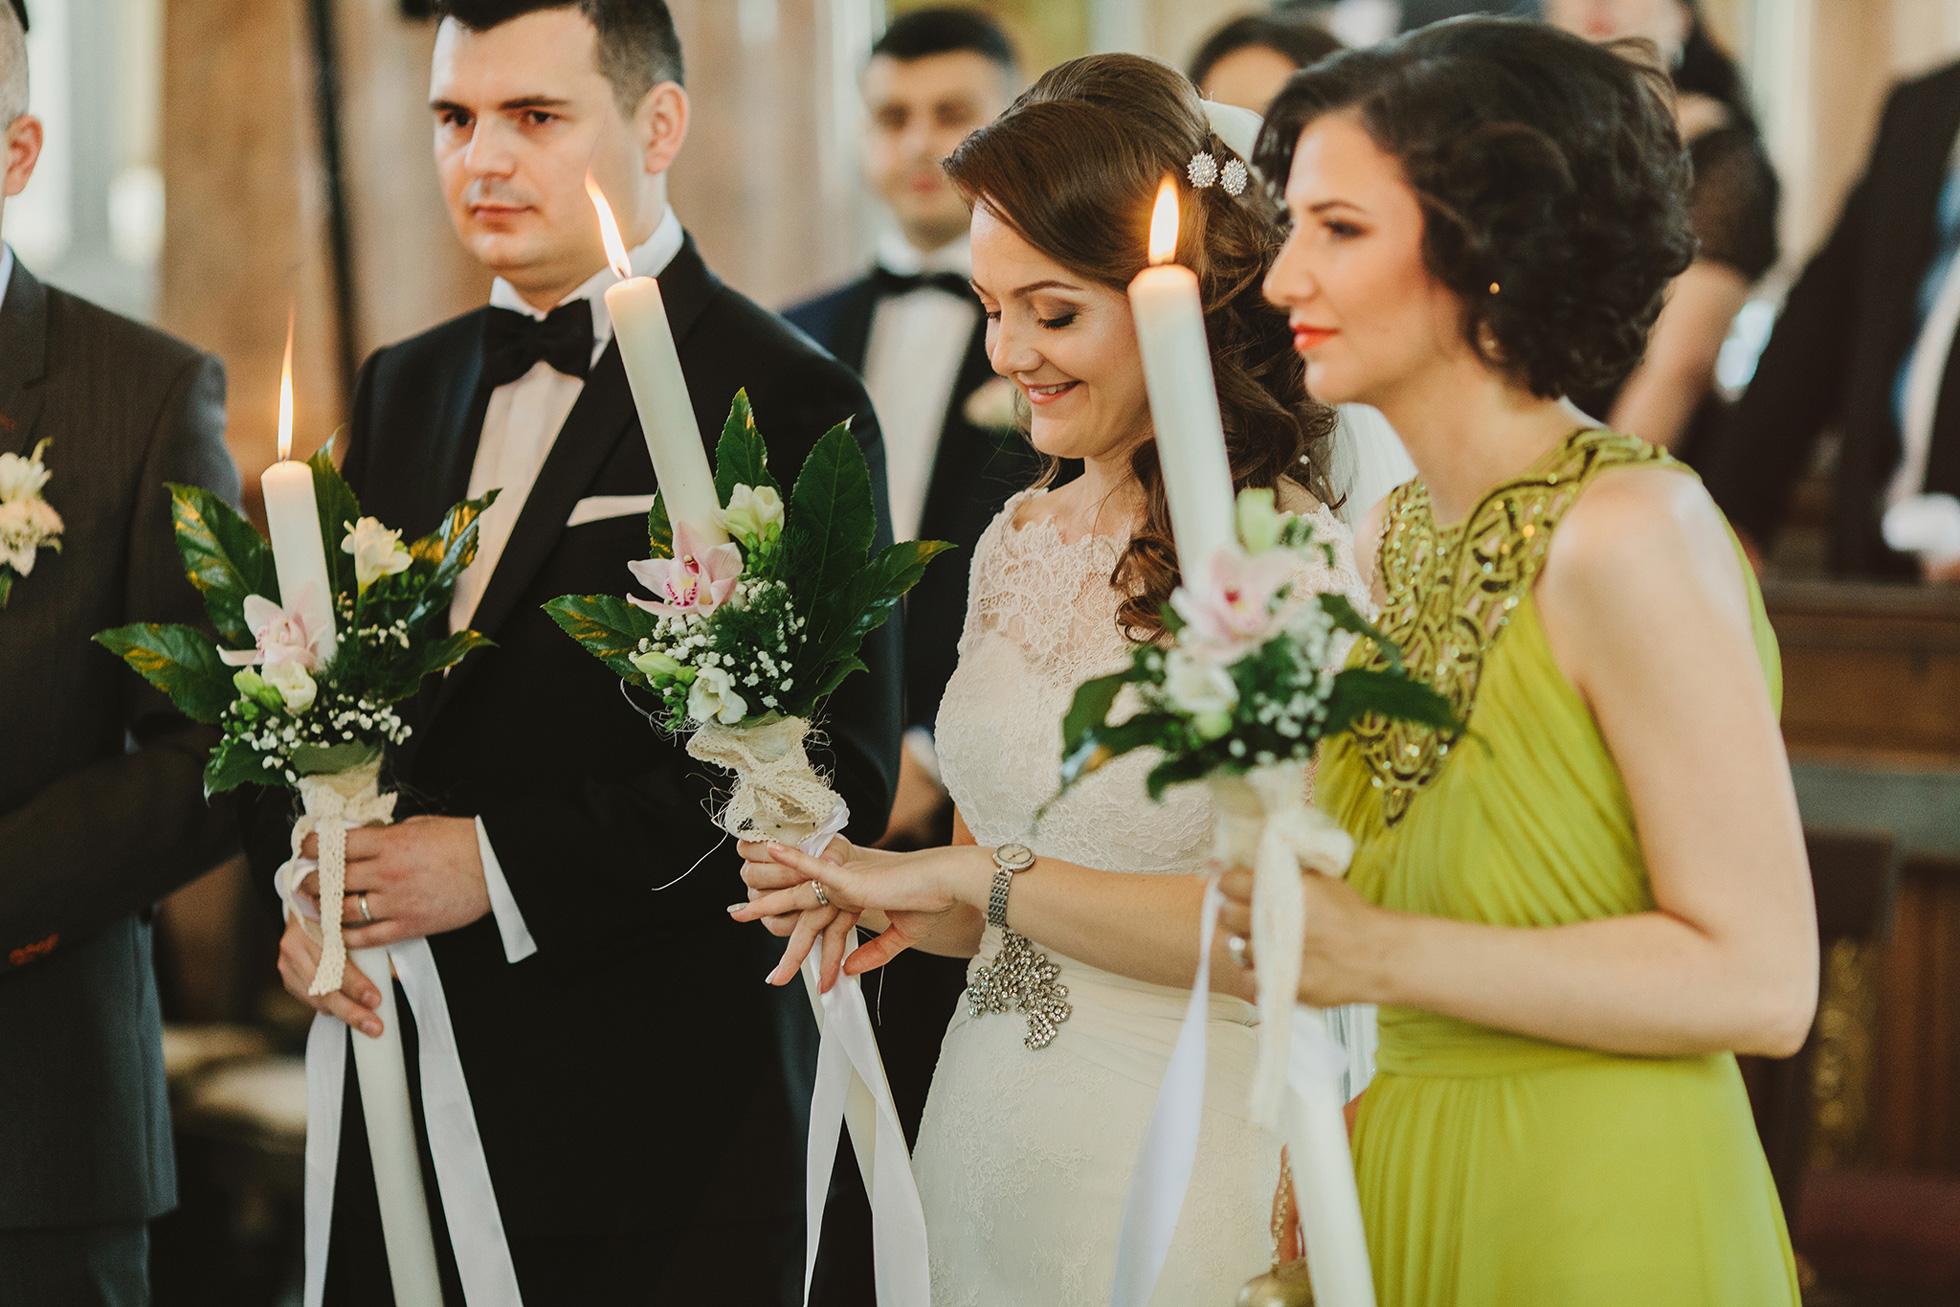 Liana-+-Florin-{wedding}-080